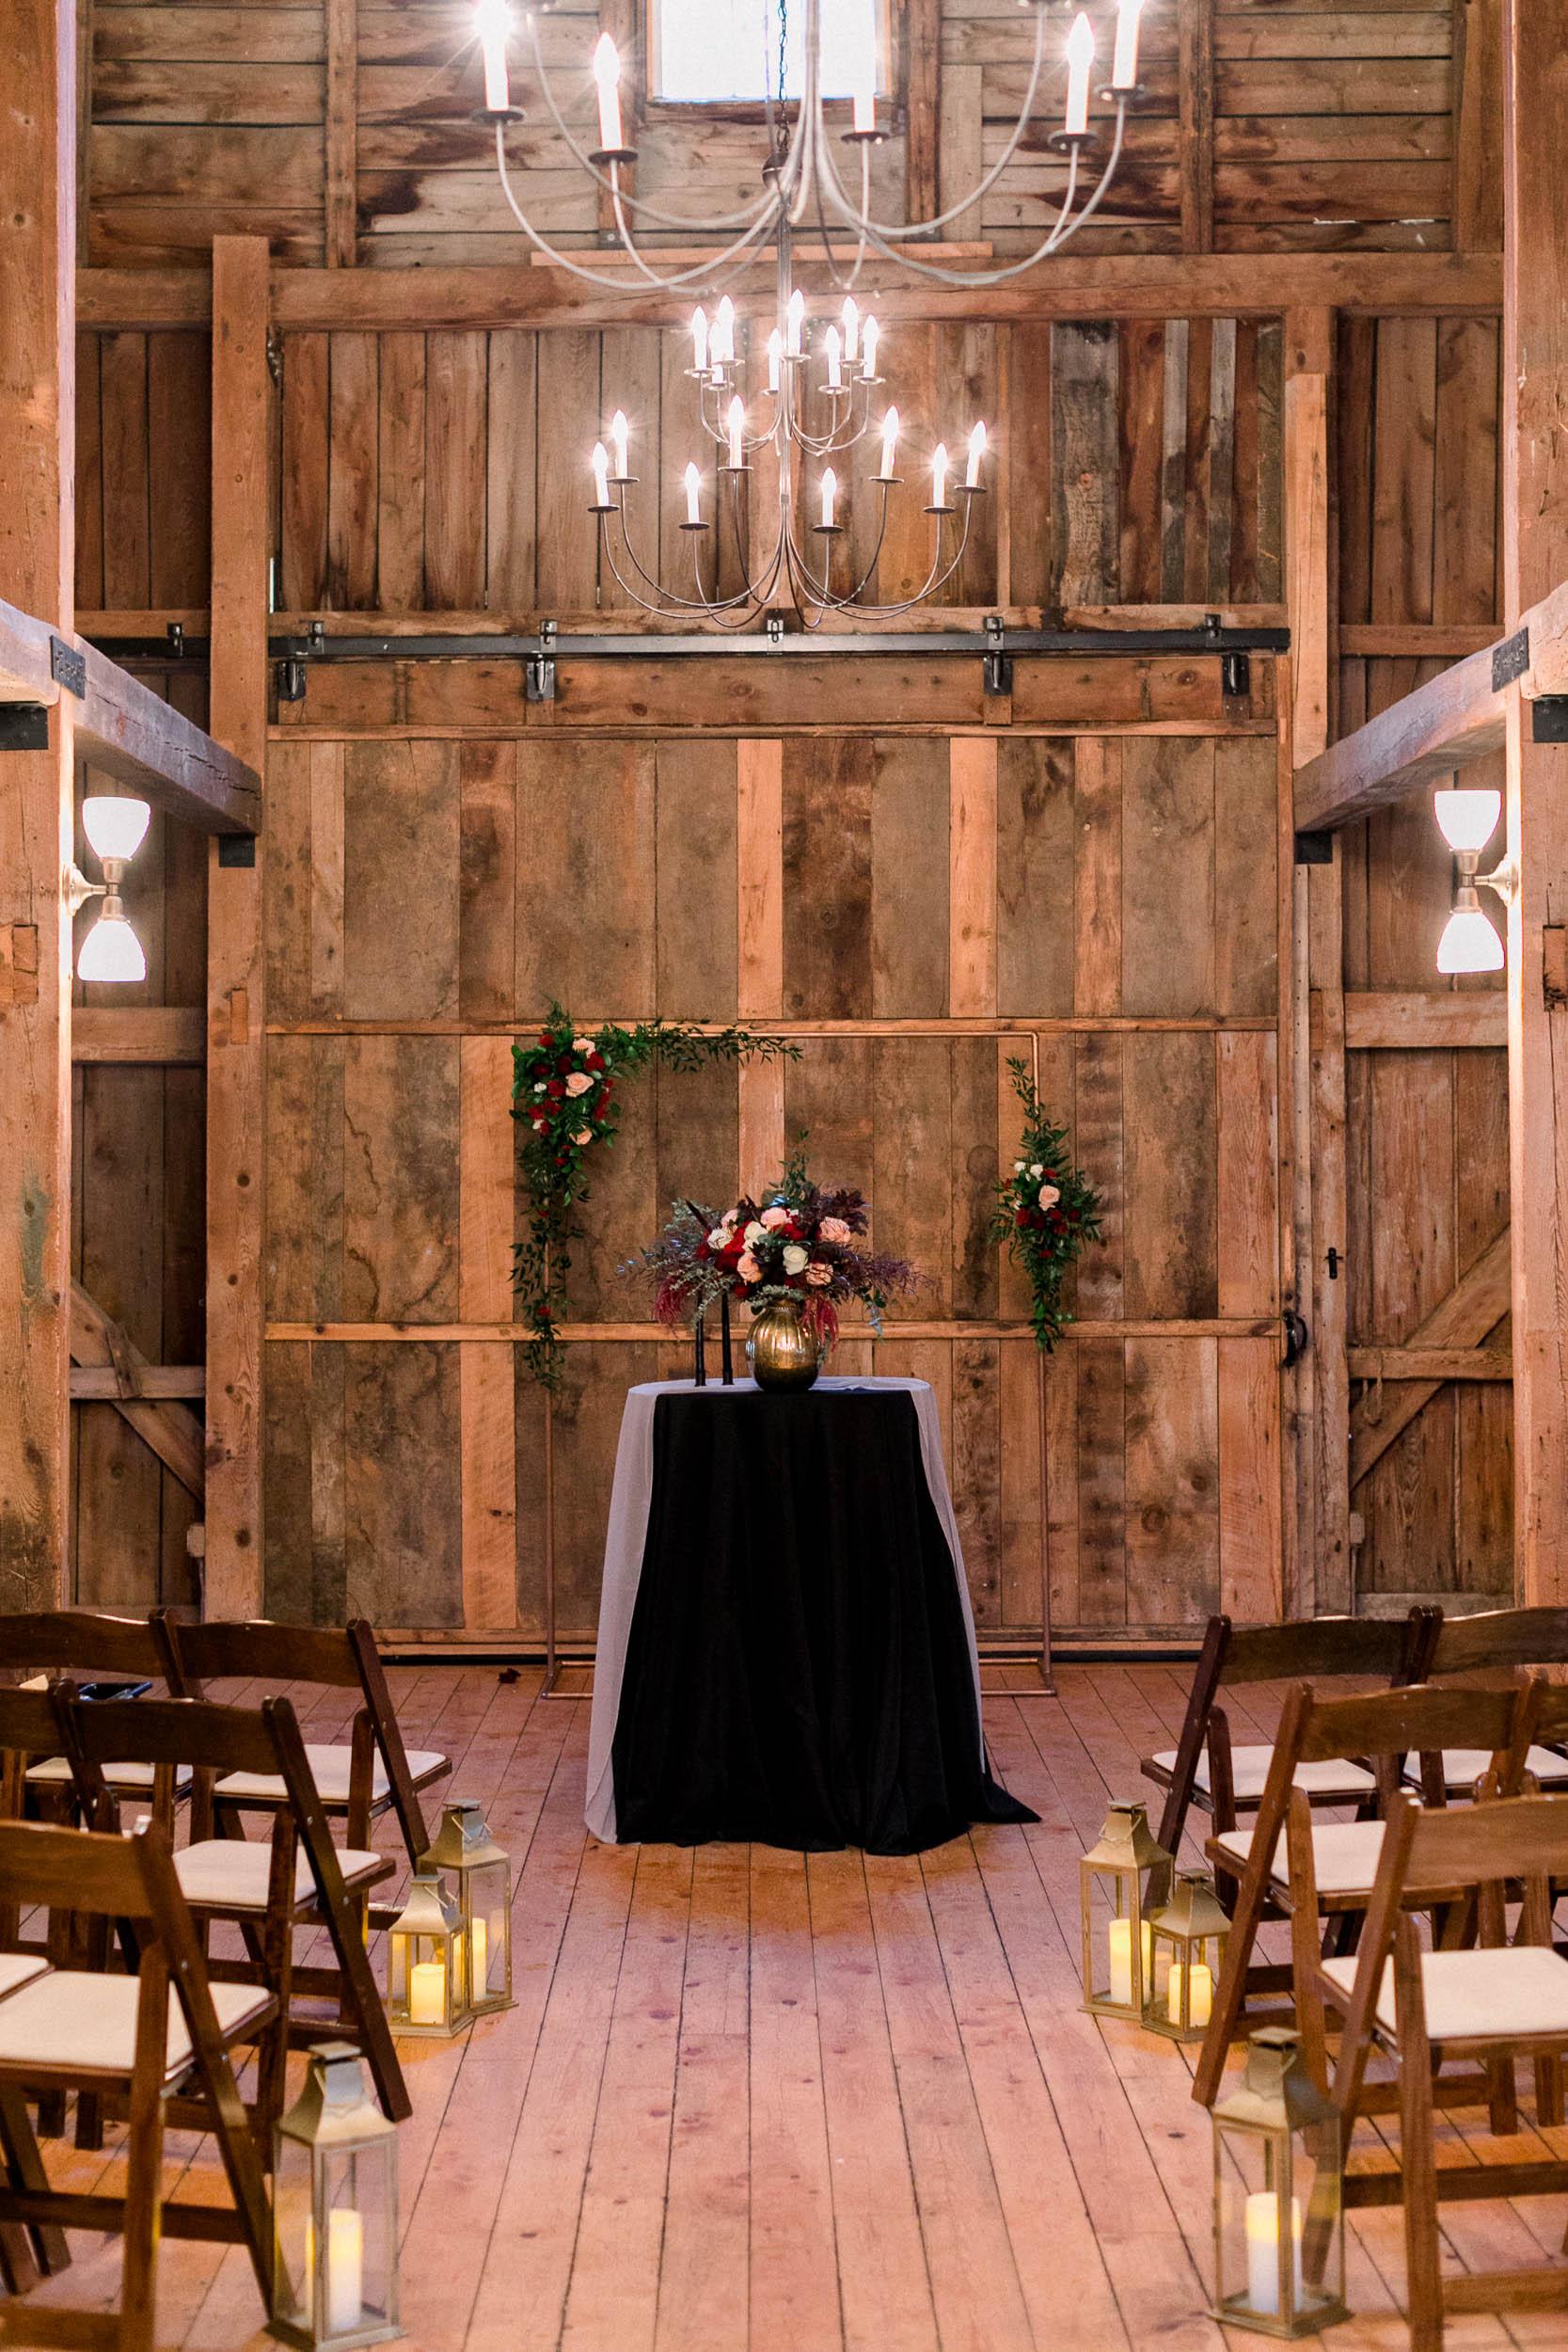 J+J_Barn at Walnut Hill_Portland Maine Wedding_Buena Lane Photography_102718_ER_242-Edit.jpg